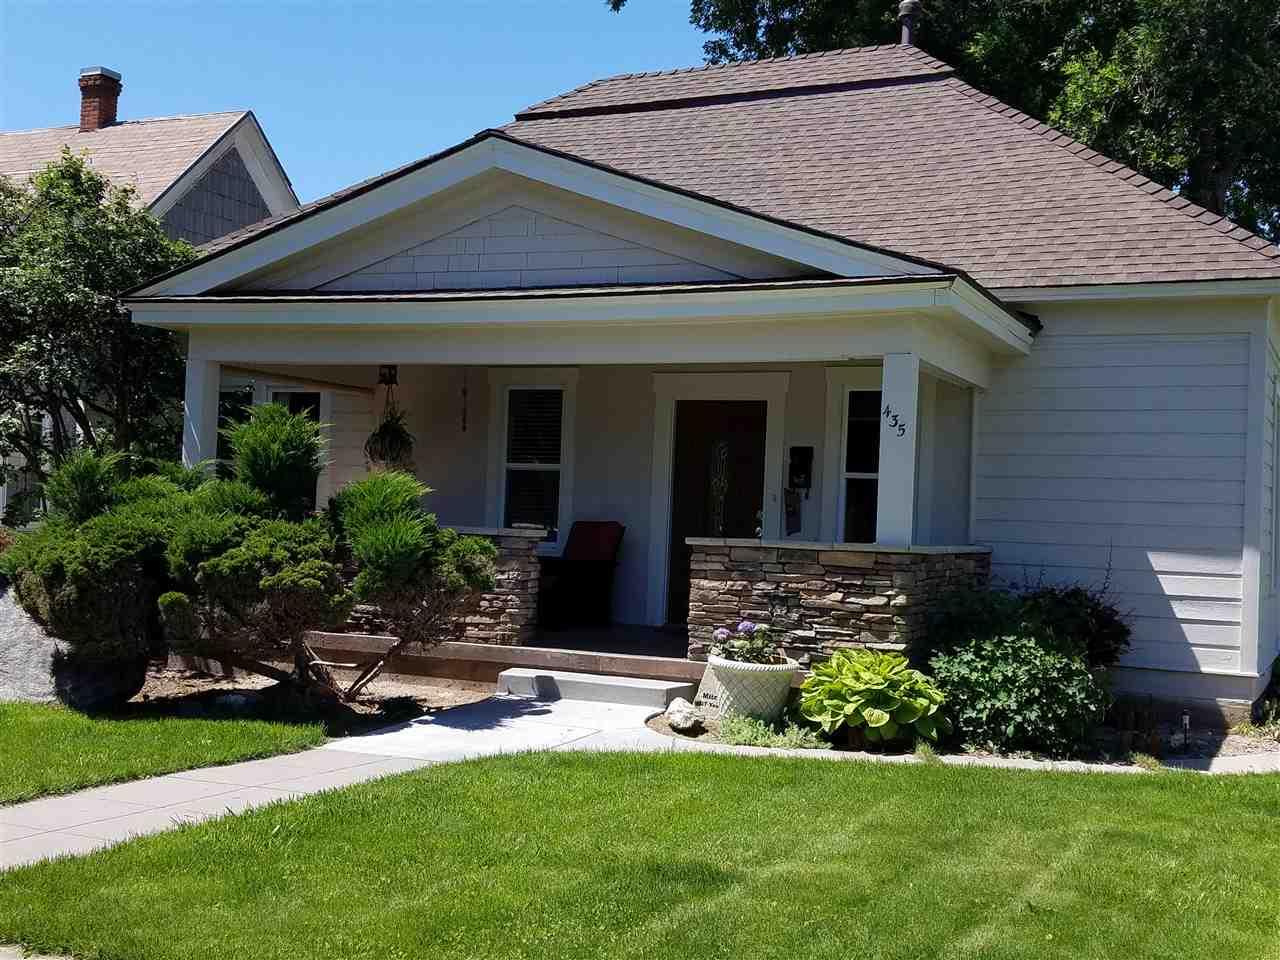 435 N 4th E, Mountain Home, ID 83647